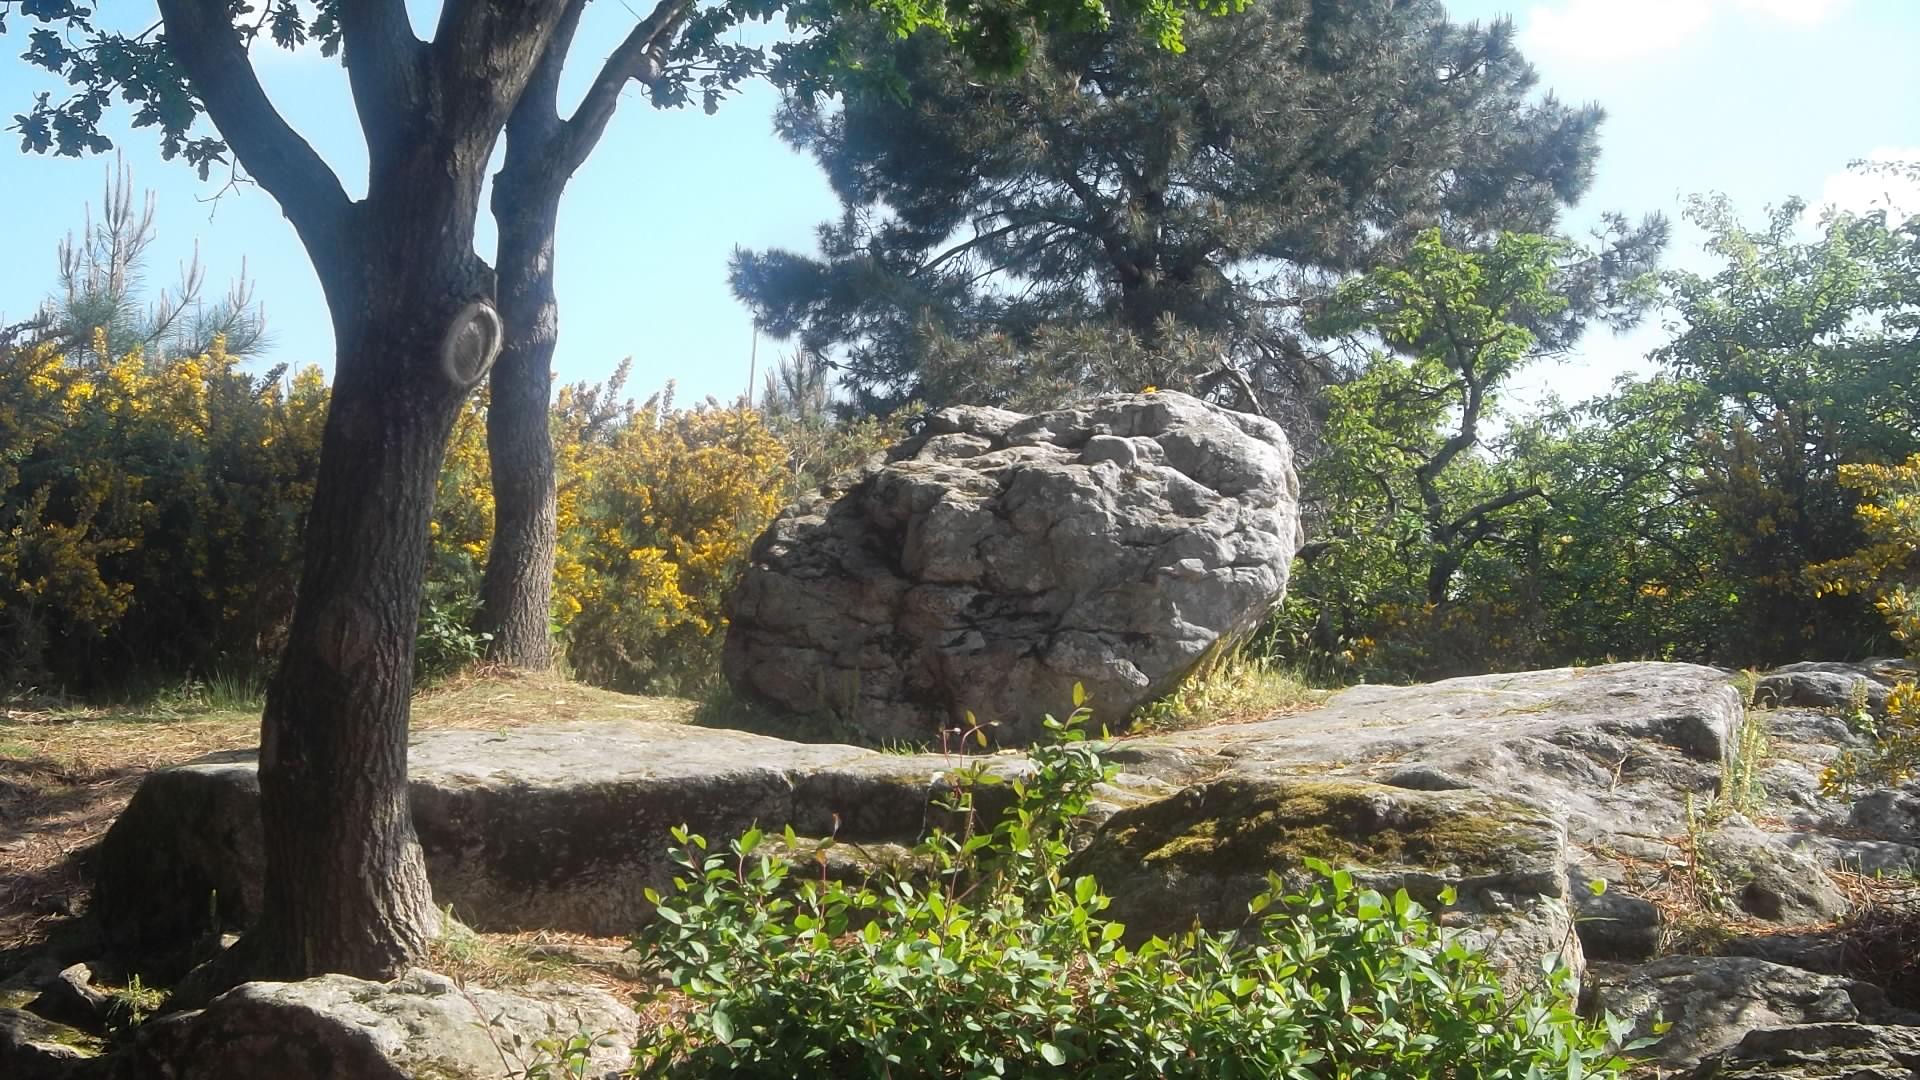 vannes pointe des emigres stone menhir may13